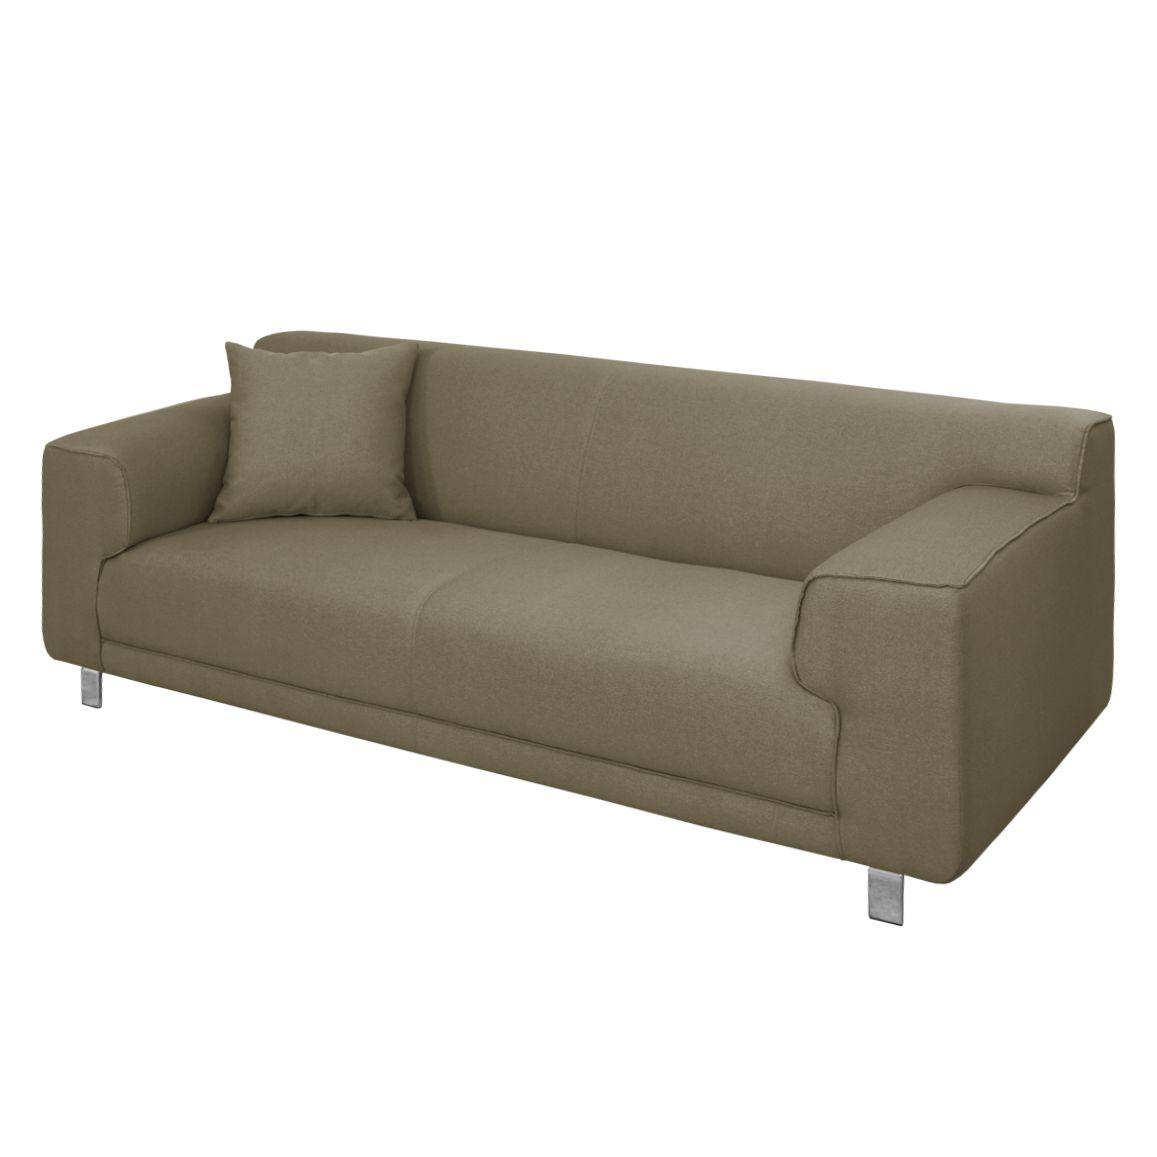 sofa zaran 3 sitzer webstoff hellbraun nuovoform. Black Bedroom Furniture Sets. Home Design Ideas